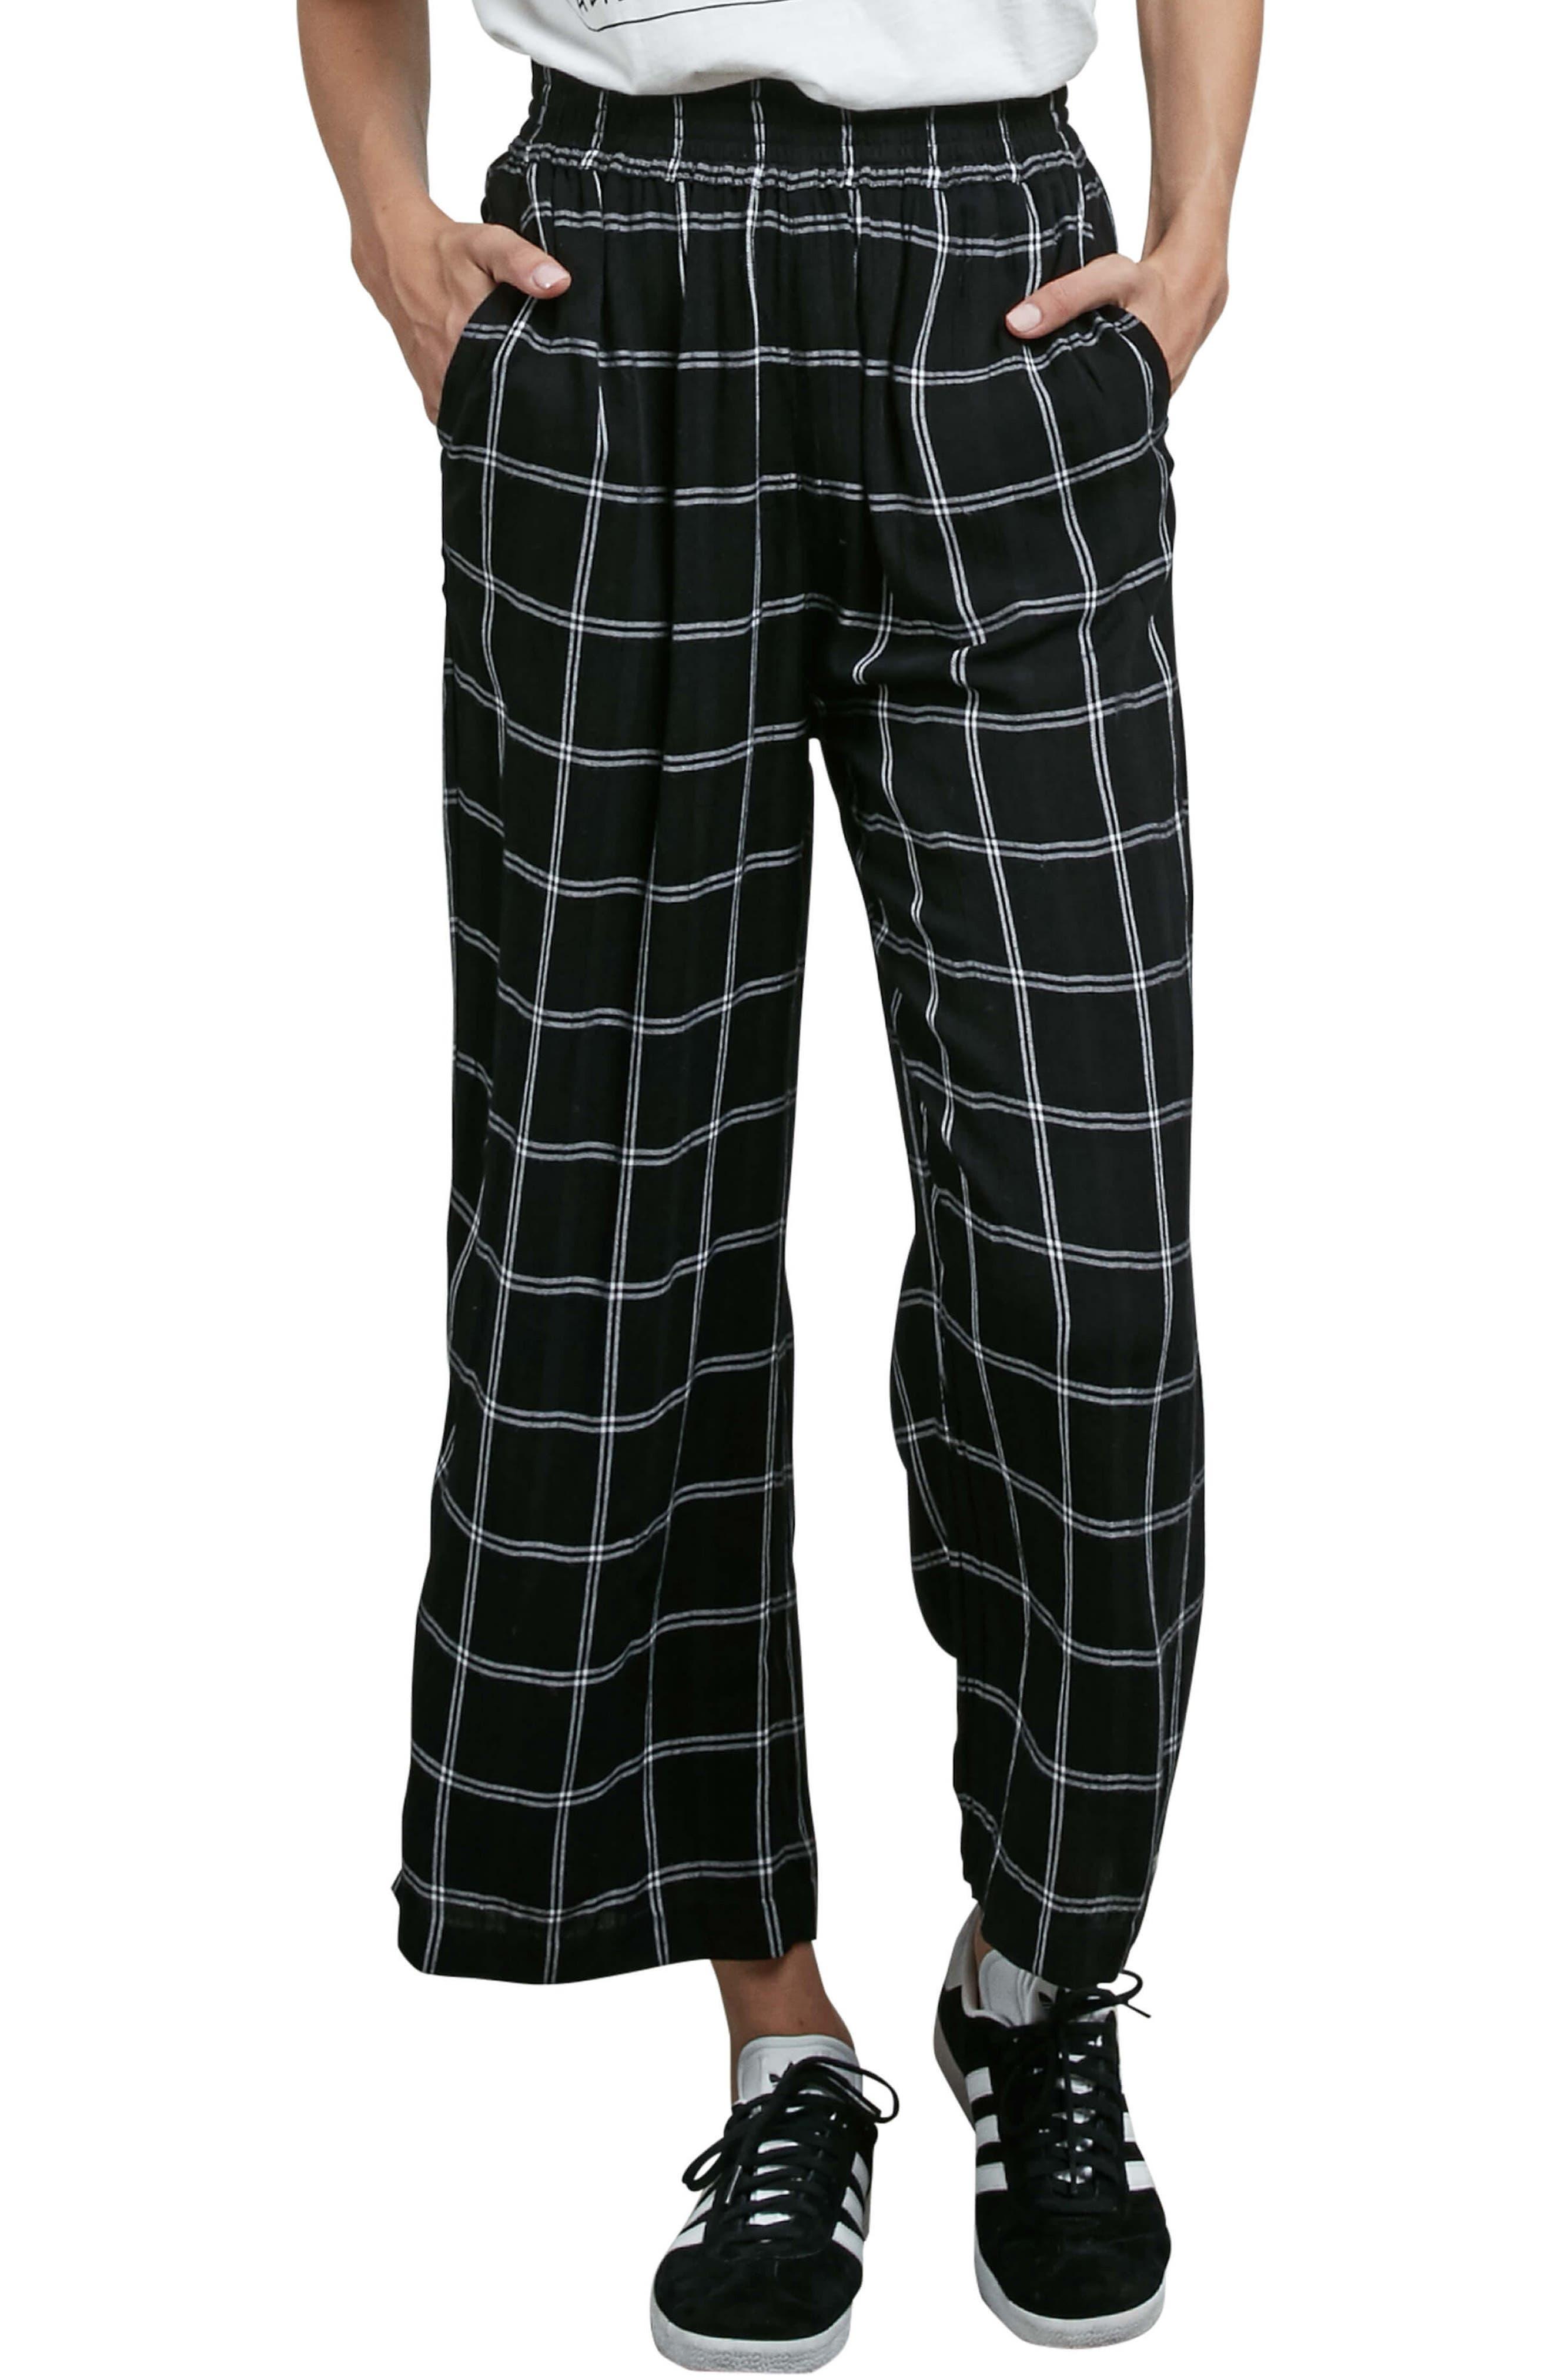 Jumponit Windowpane Crop Pants,                         Main,                         color, Black